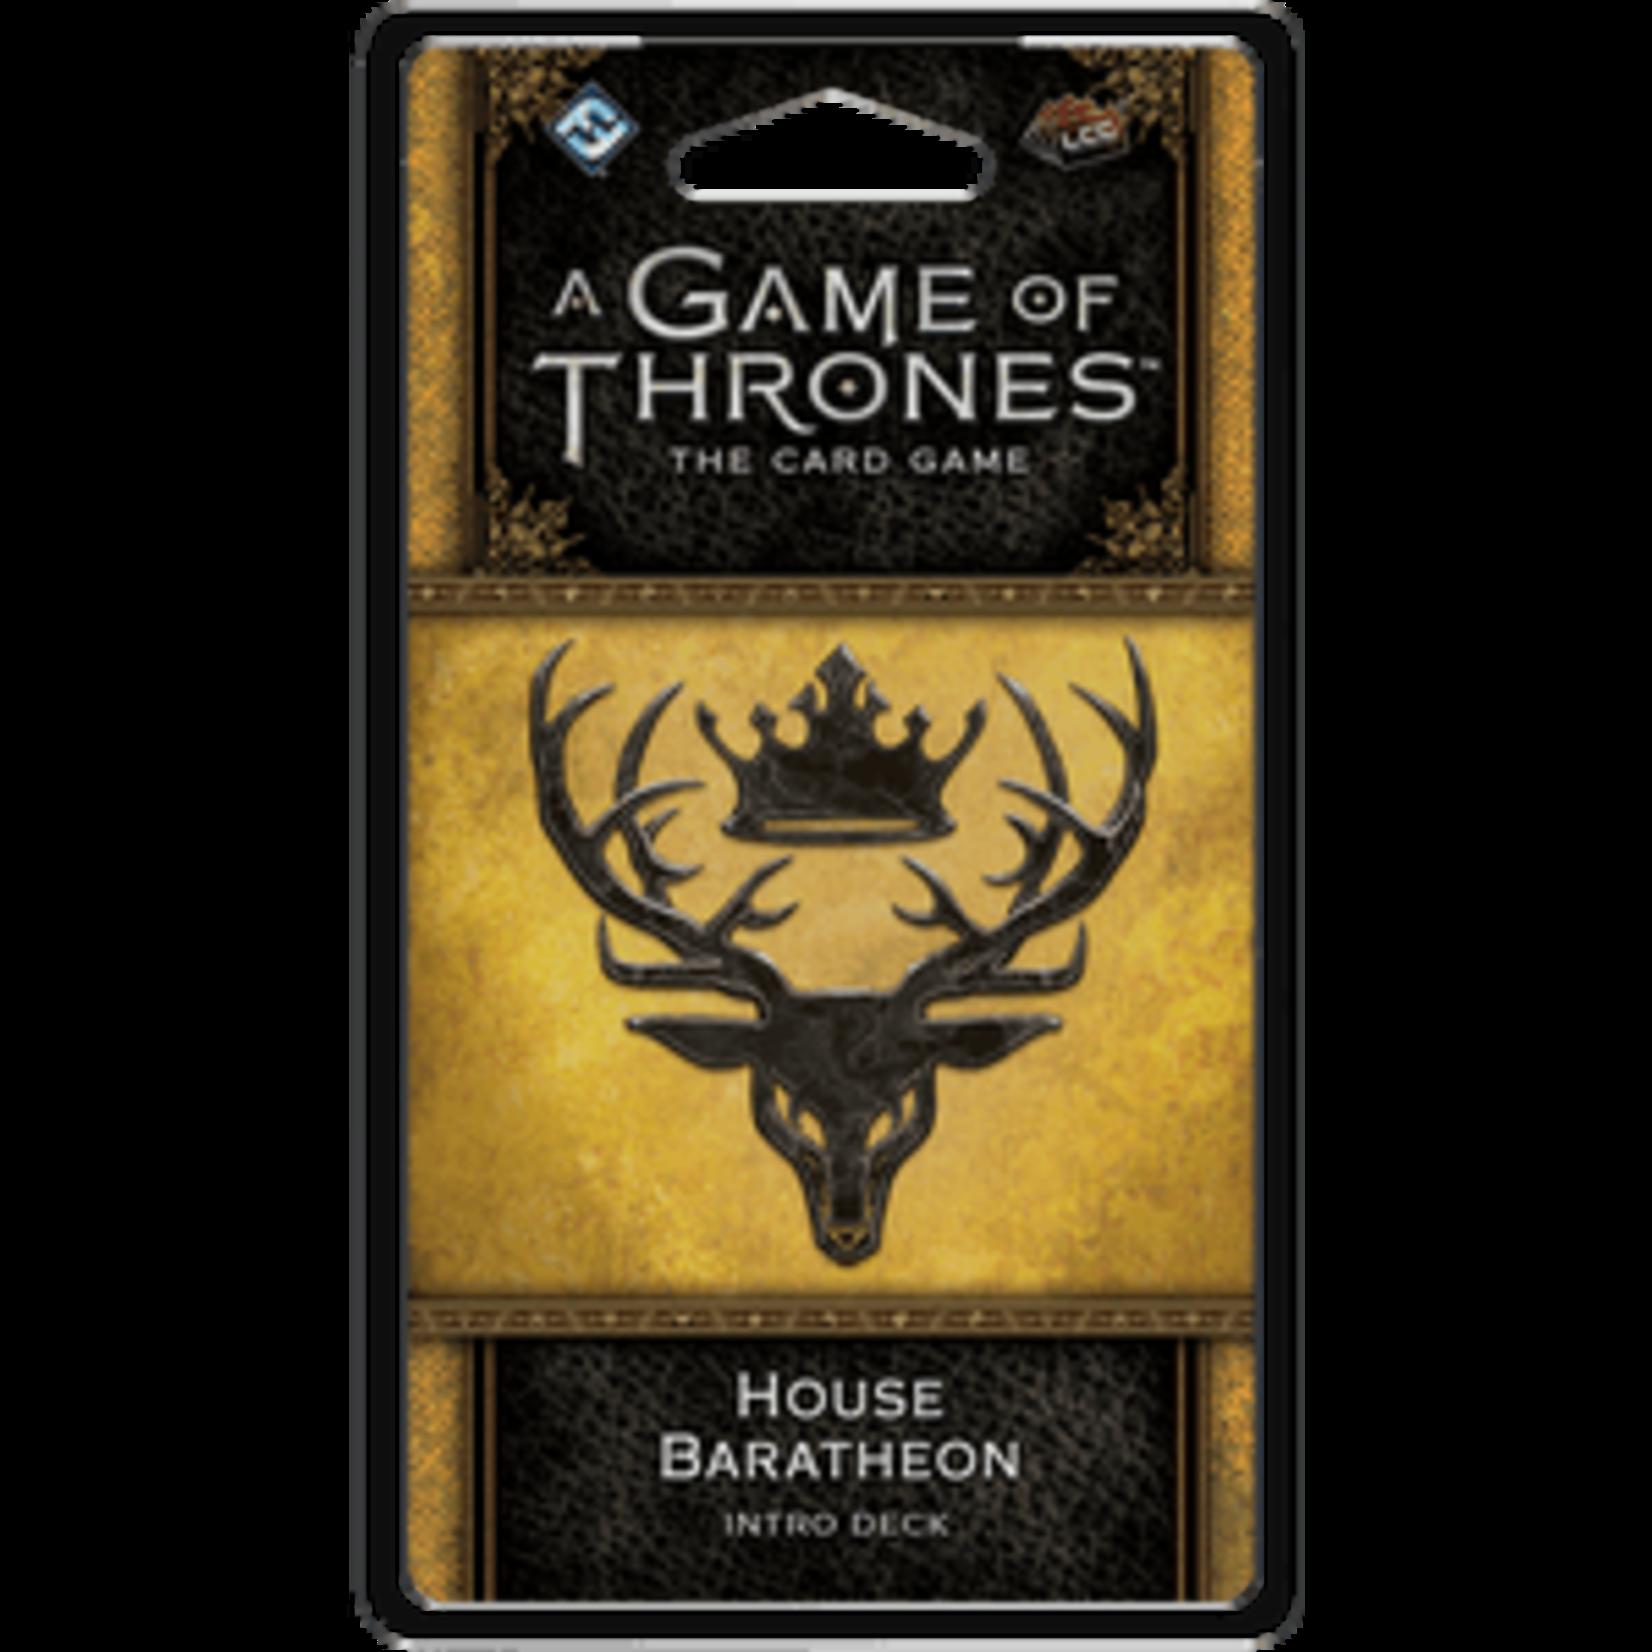 Game of Thrones LCG House Baratheon Intro Deck